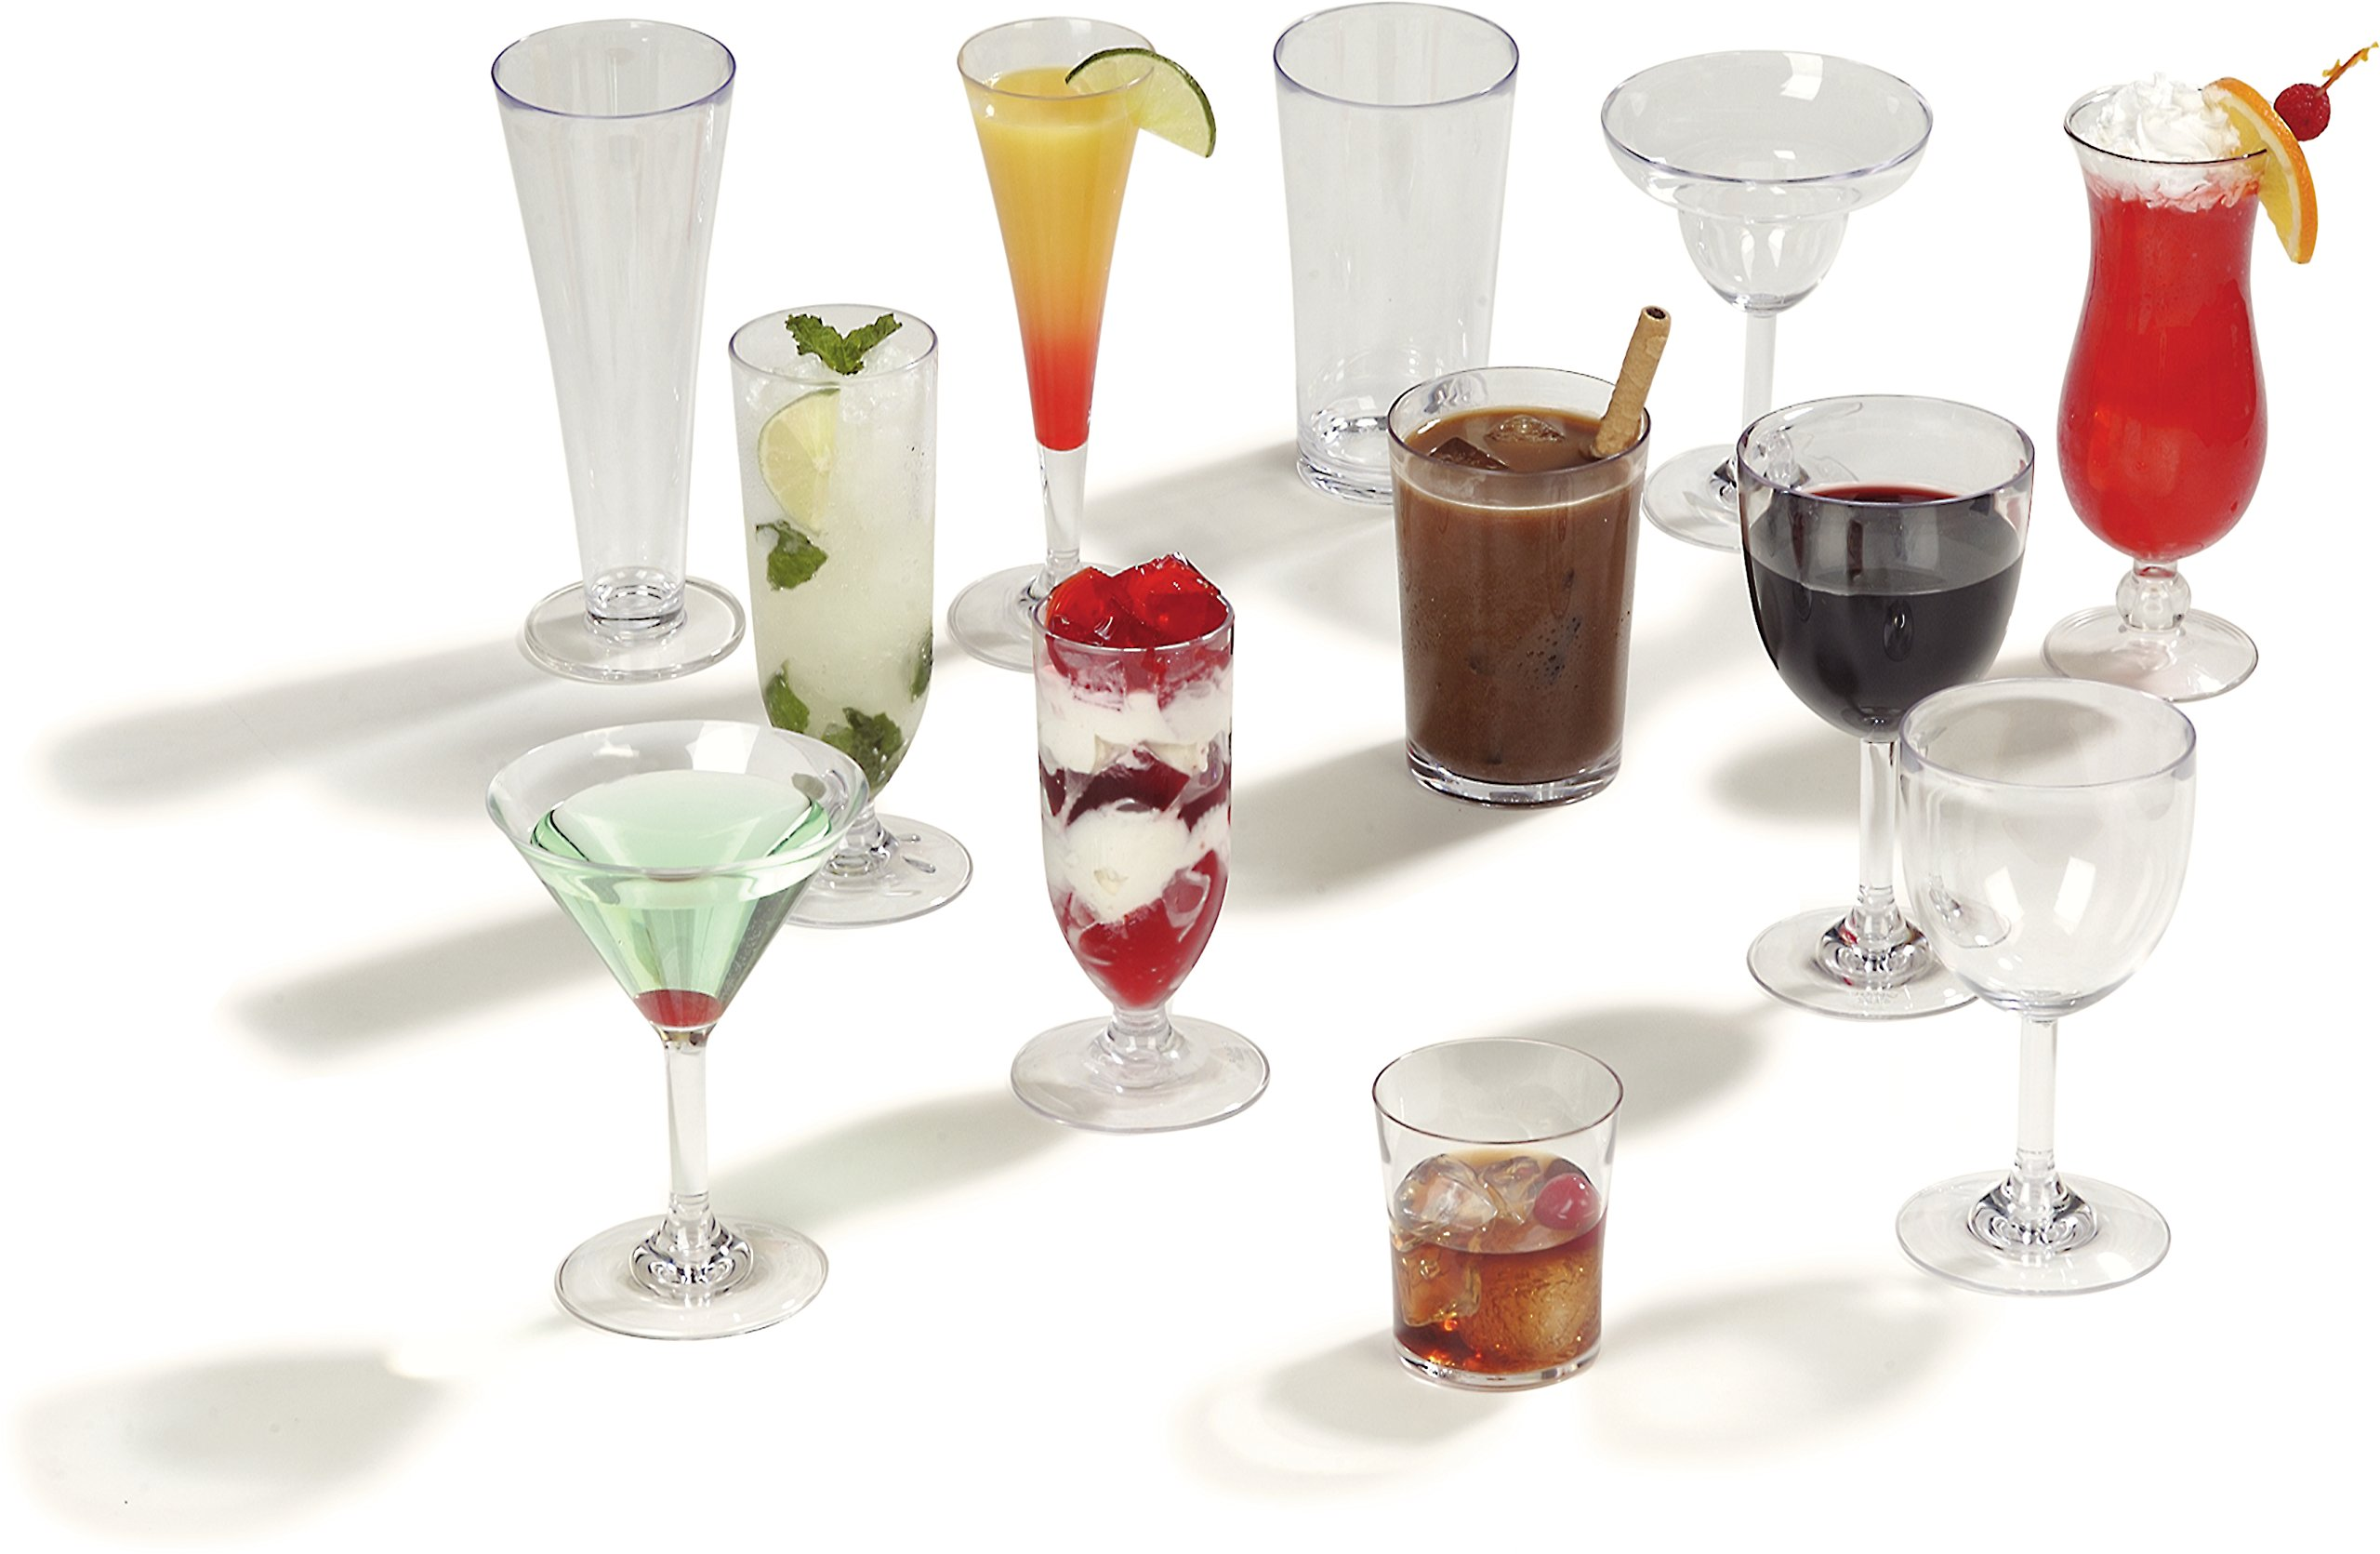 Carlisle 4362707 Liberty Polycarbonate Martini Glass, 8-oz. Capacity, Clear (Case of 24) by Carlisle (Image #7)